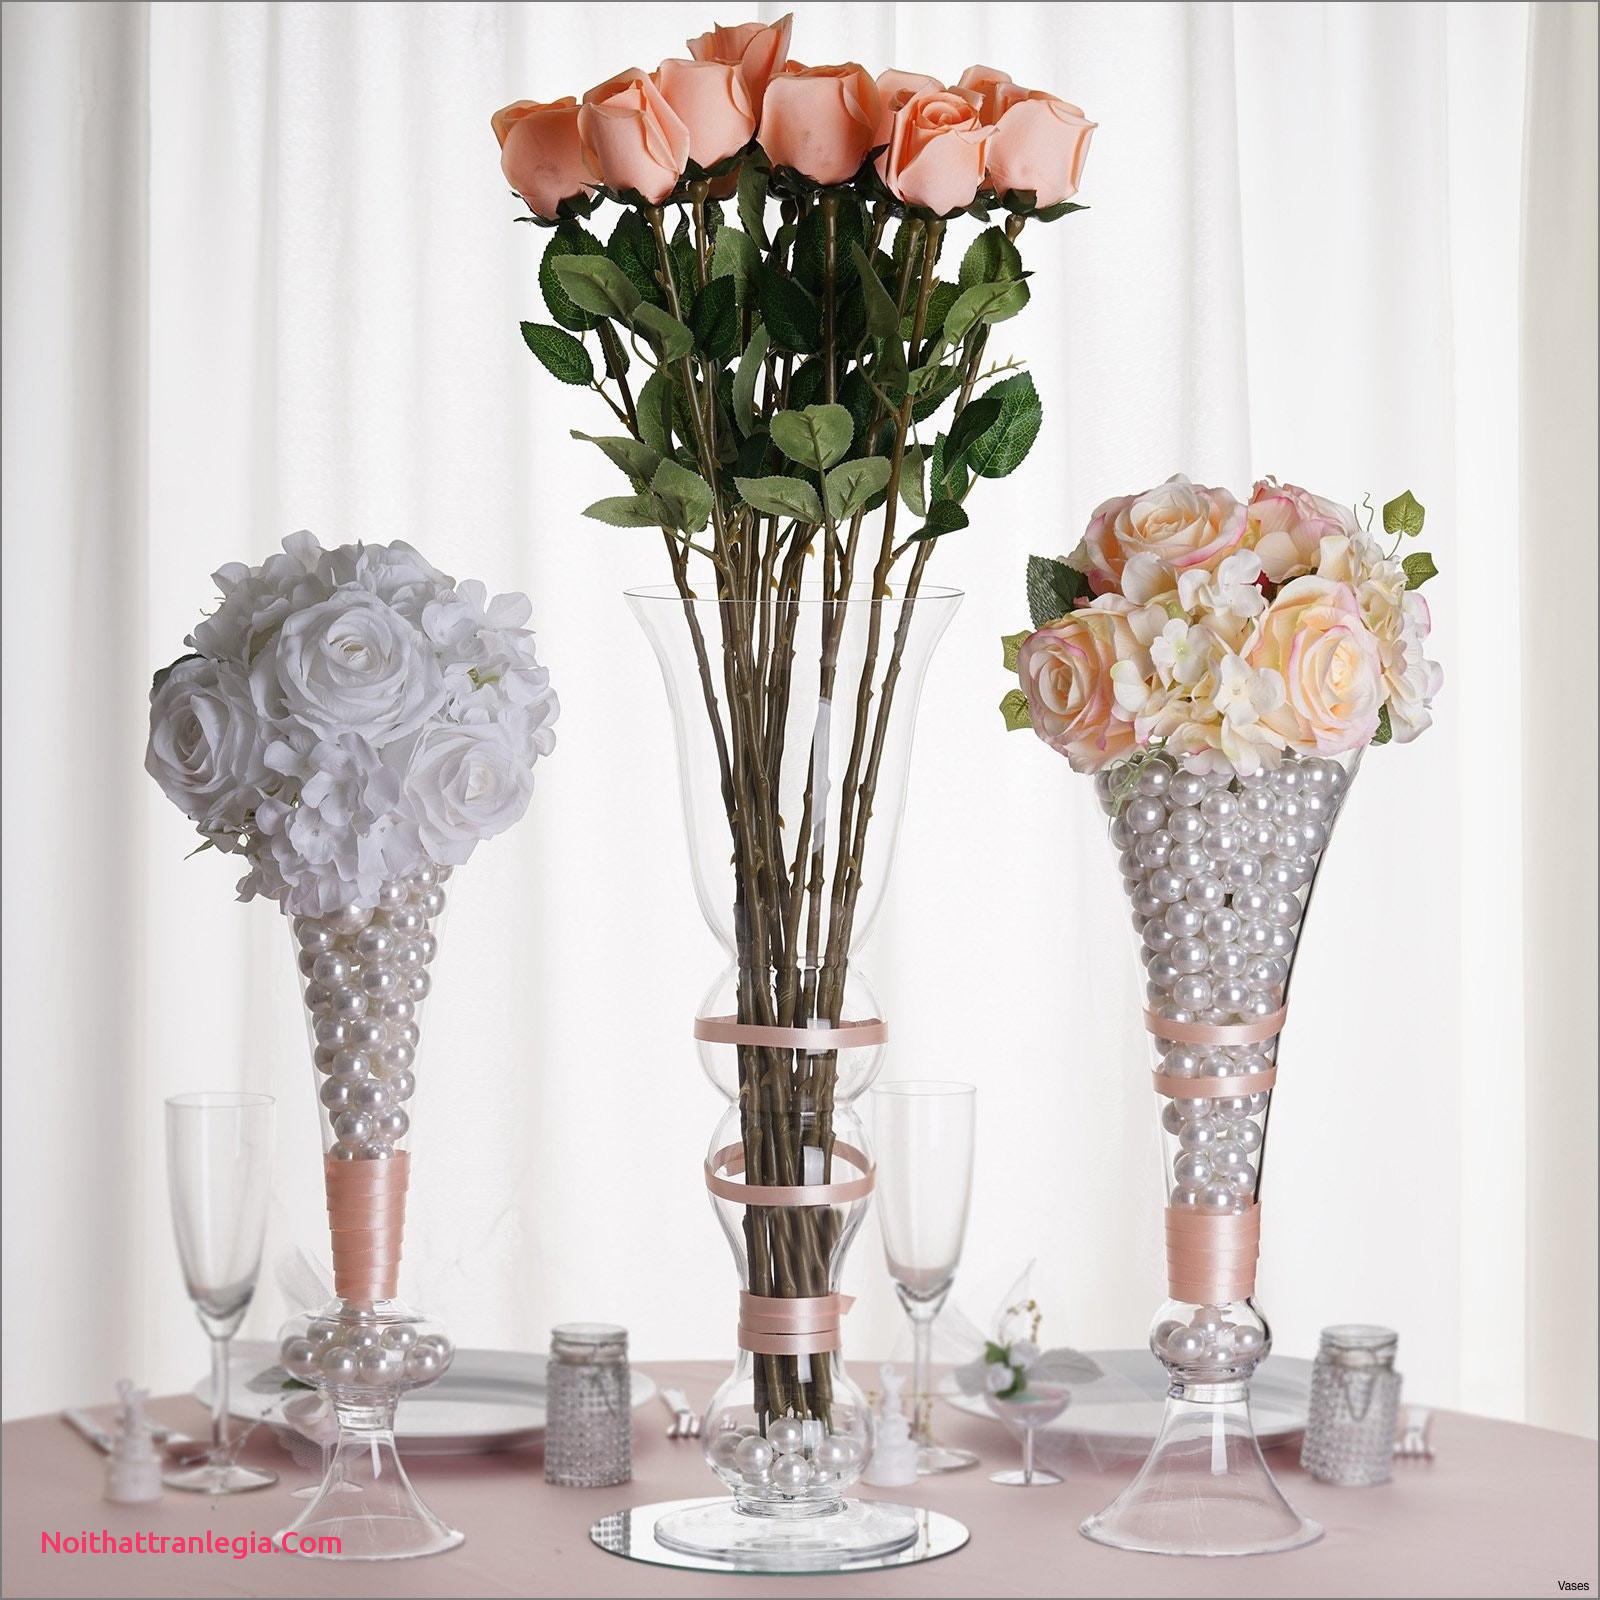 Single Rose Glass Vase Of 20 How to Clean Flower Vases Noithattranlegia Vases Design Throughout Update Clipart Awesome Flower Vase Table 04h Vases Tablei 0d Clipart Dining Base End Design